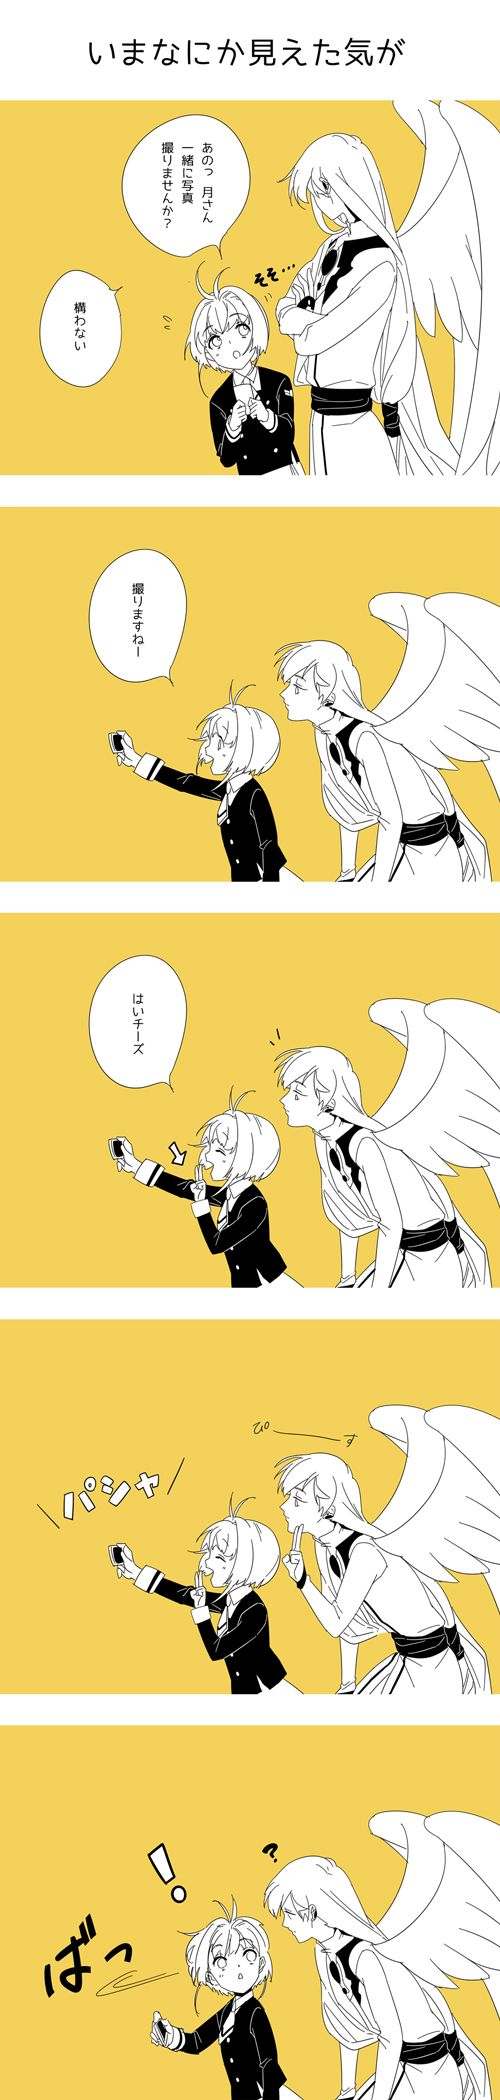 「CCさくらログ」/「柊馬」の漫画 [pixiv]